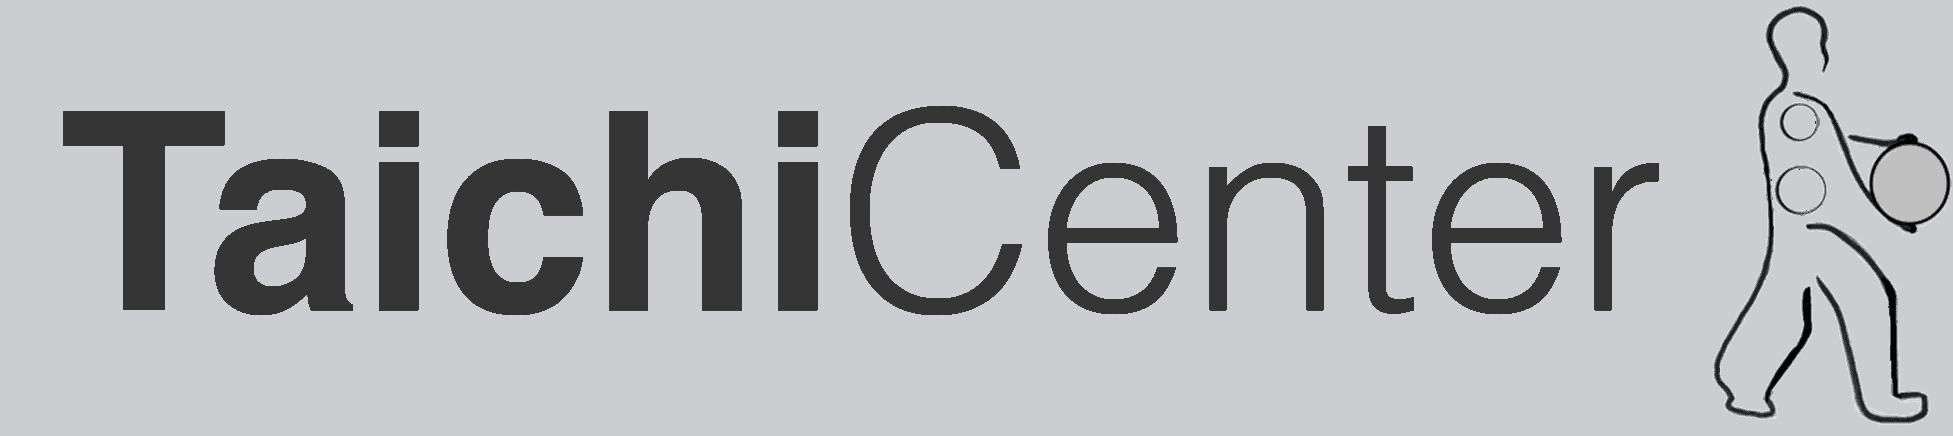 taichicenter logo